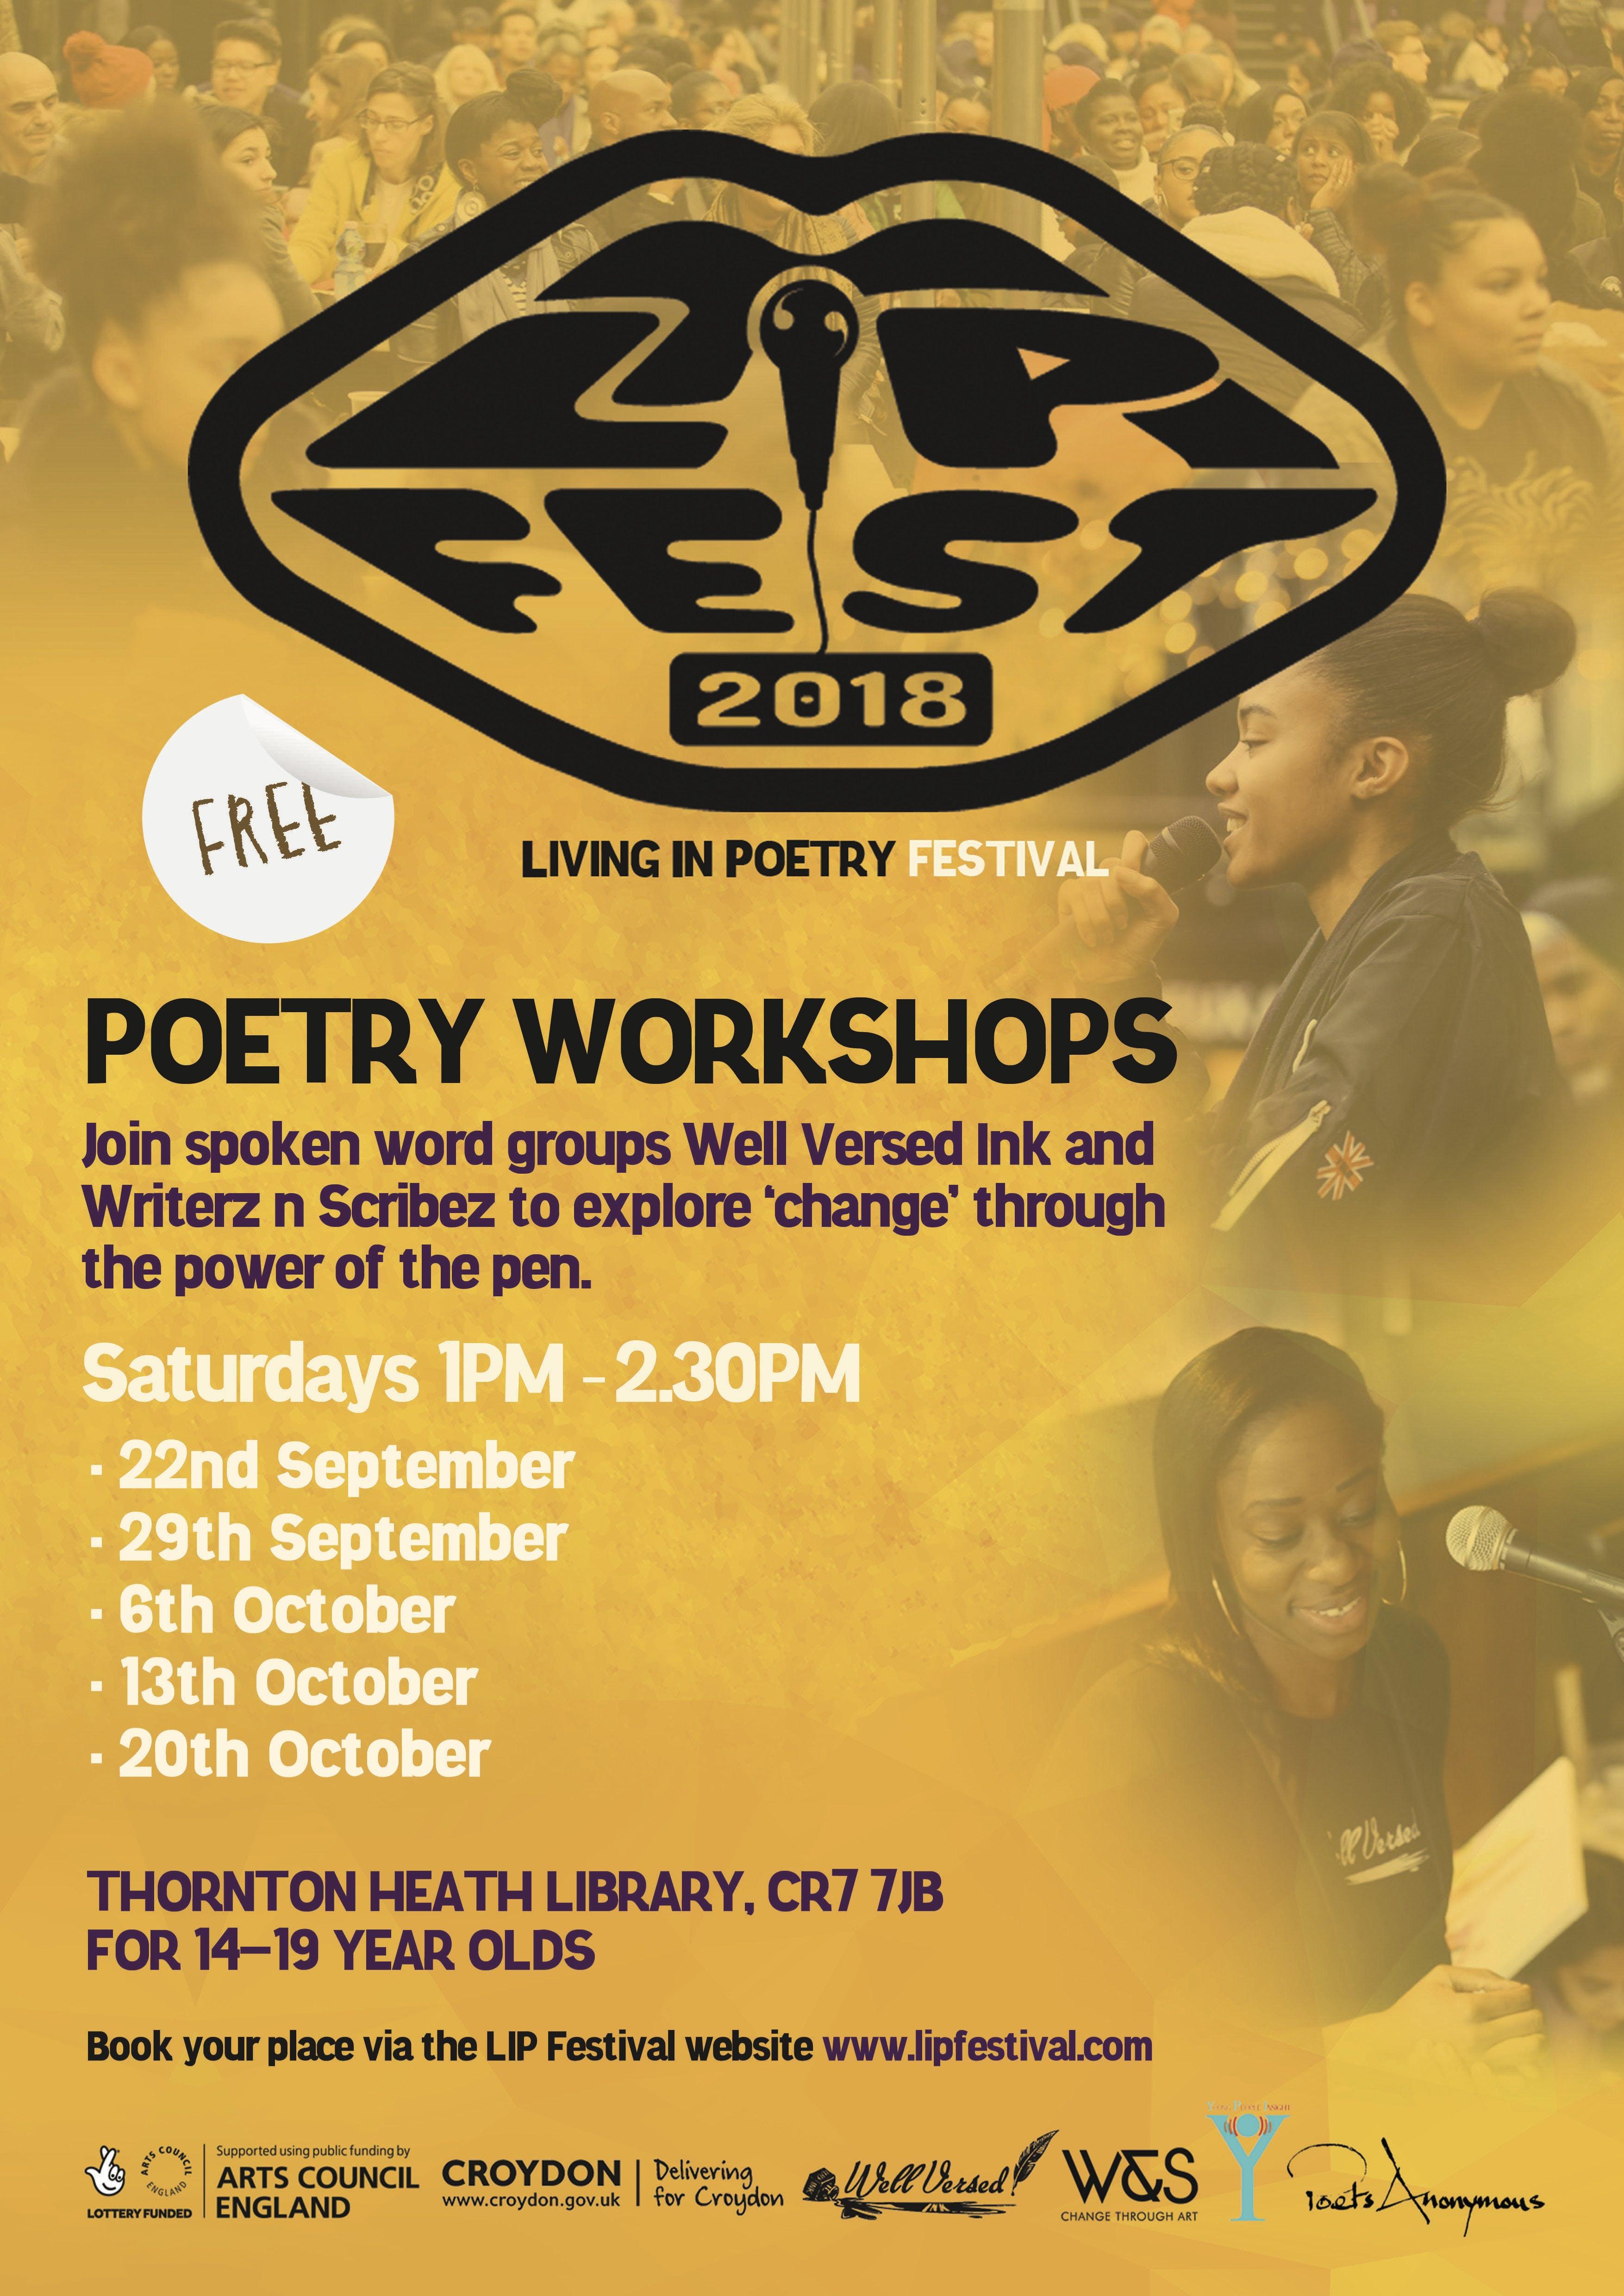 LIP Festival Poetry Workshops (14-19 year olds)